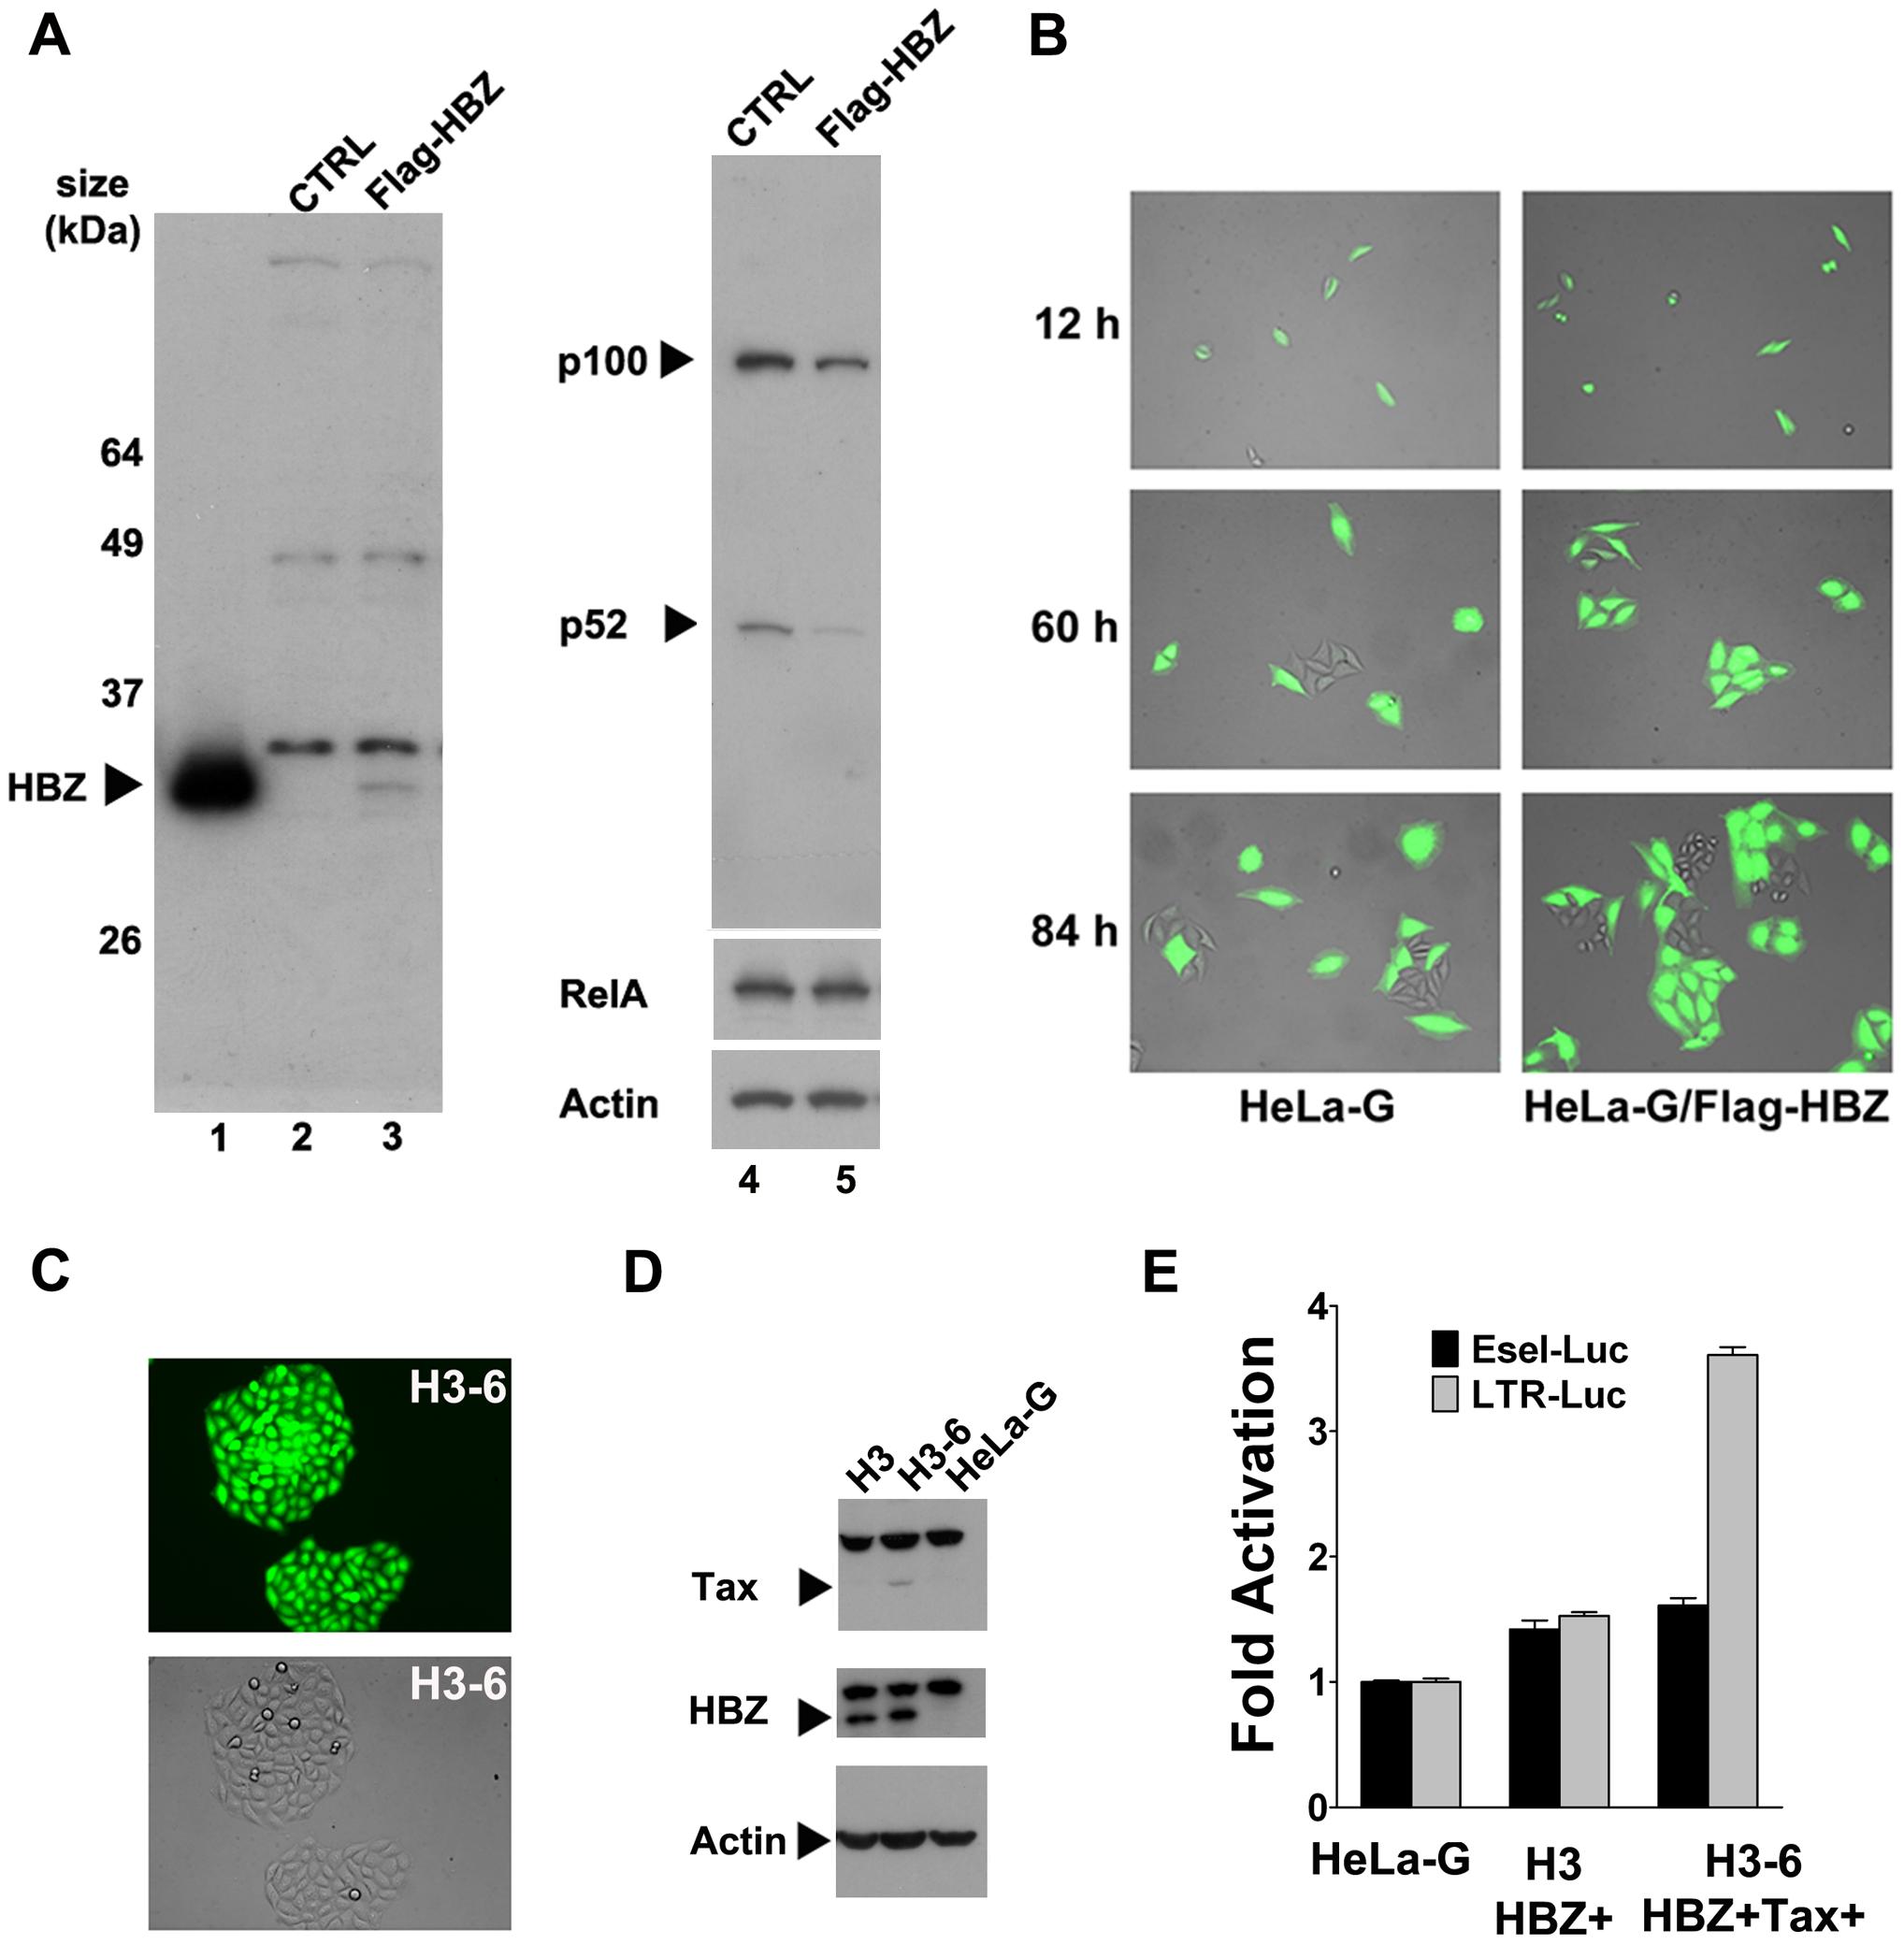 HTLV-1 HBZ mitigates cellular senescence induced by Tax.